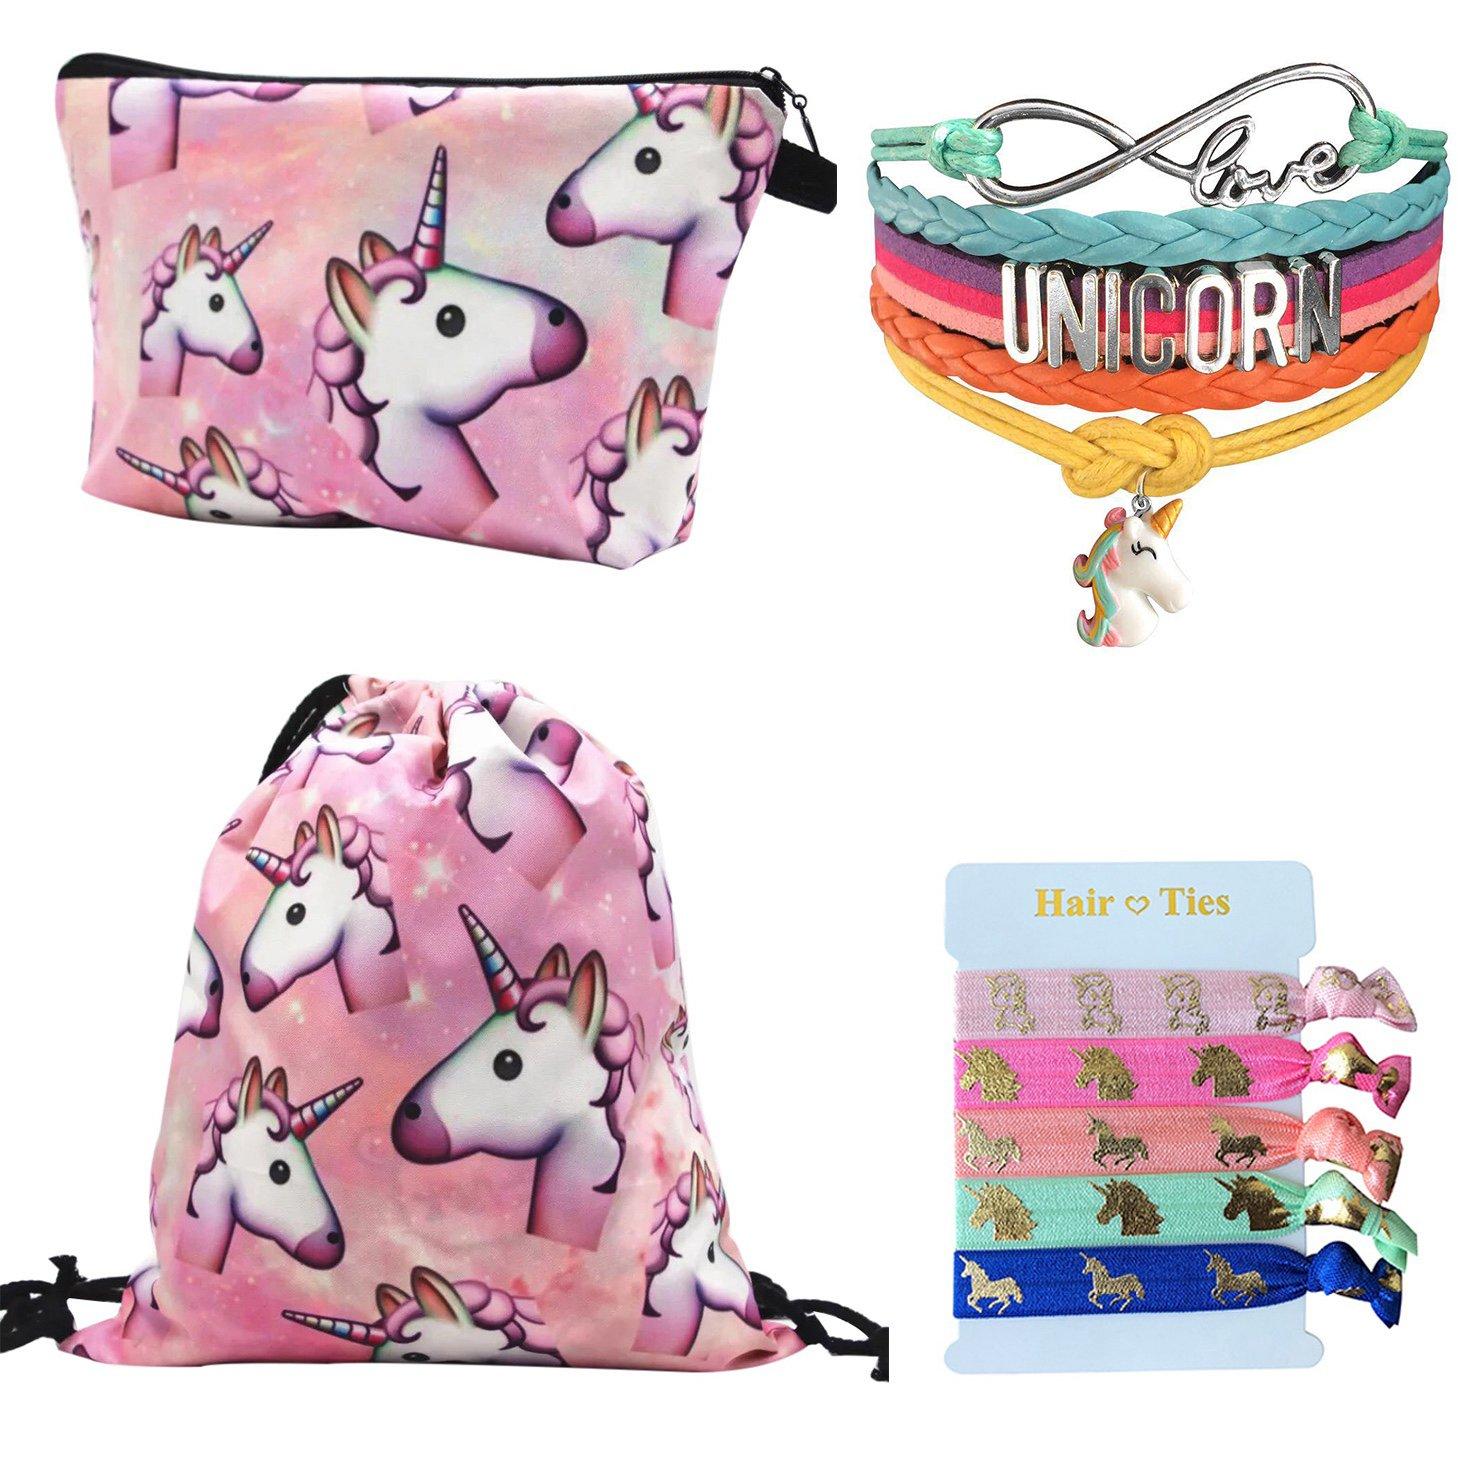 Unicorn Gifts 4 Pack - Unicorn Drawstring Backpack/Makeup Bag/Rainbow Bracelet/Hair Tie (Pink 2)